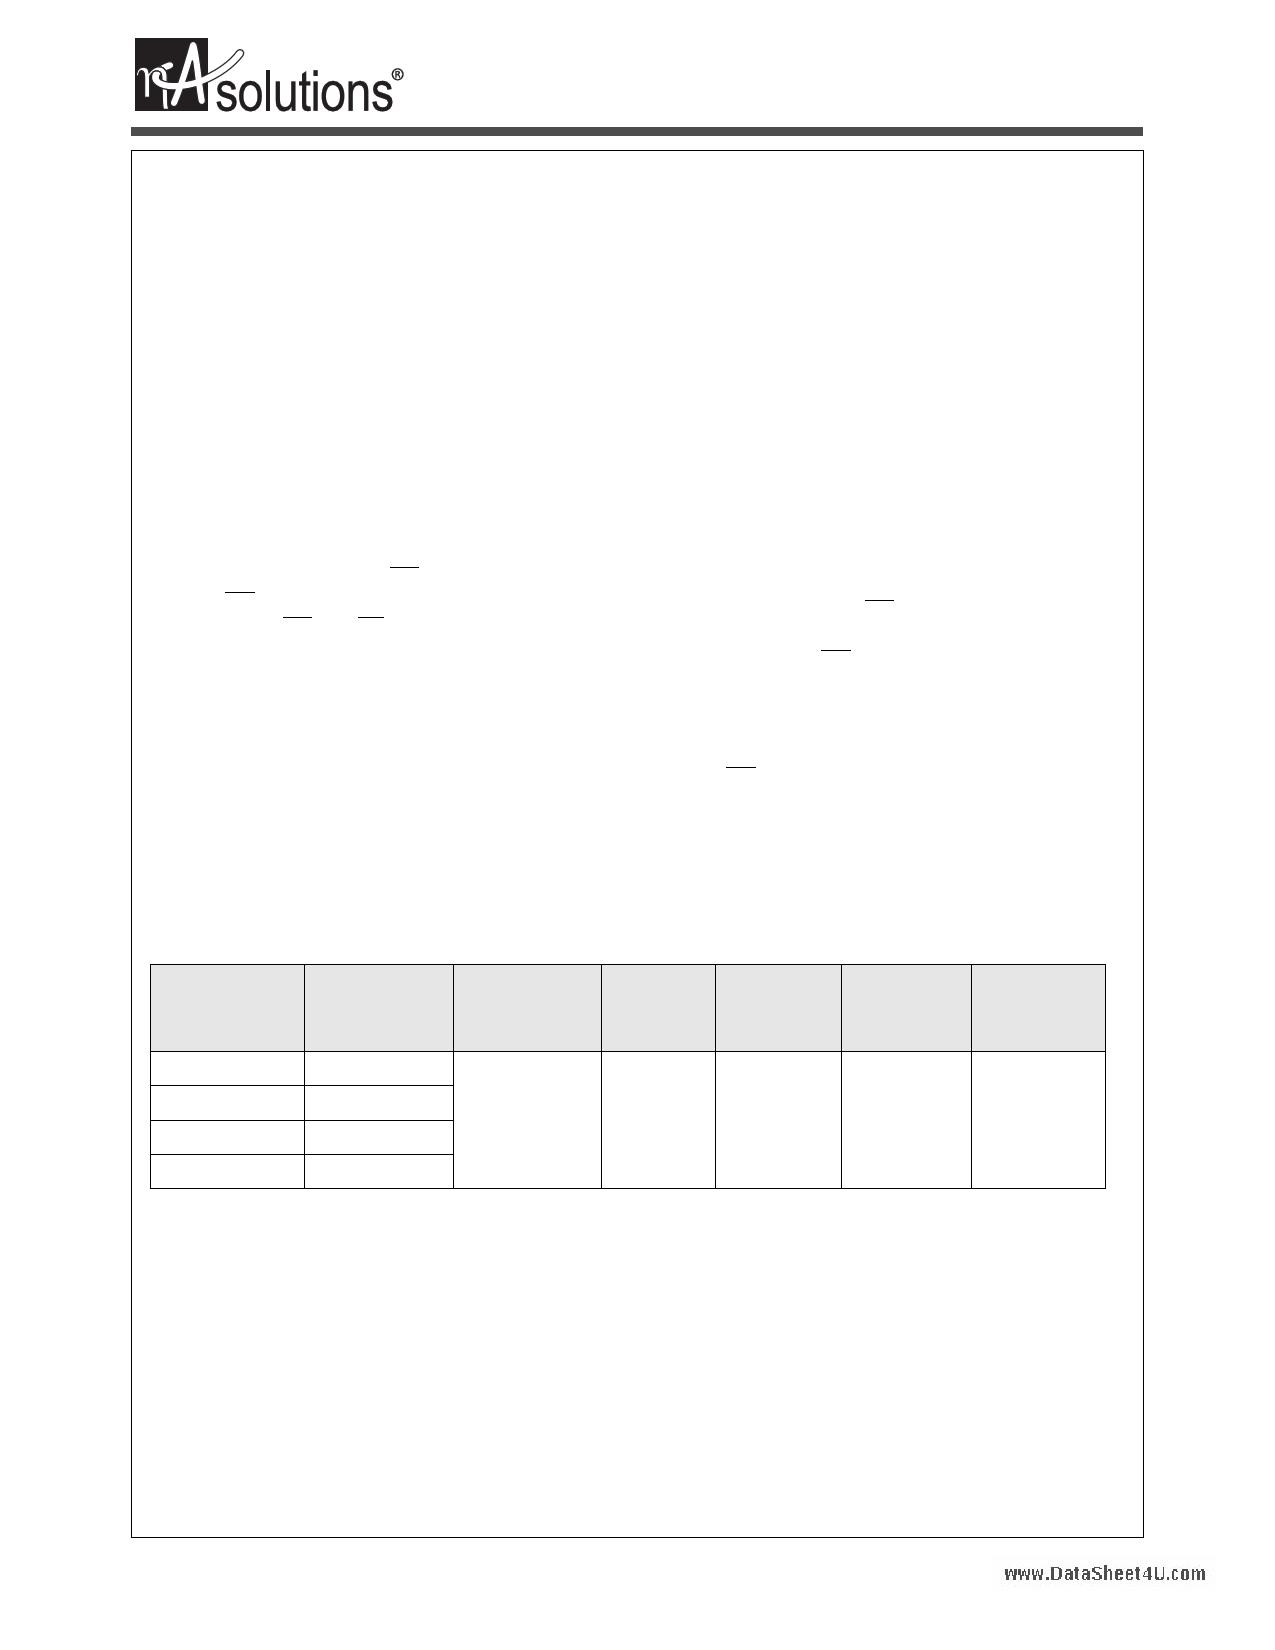 N02L1618C1A datasheet